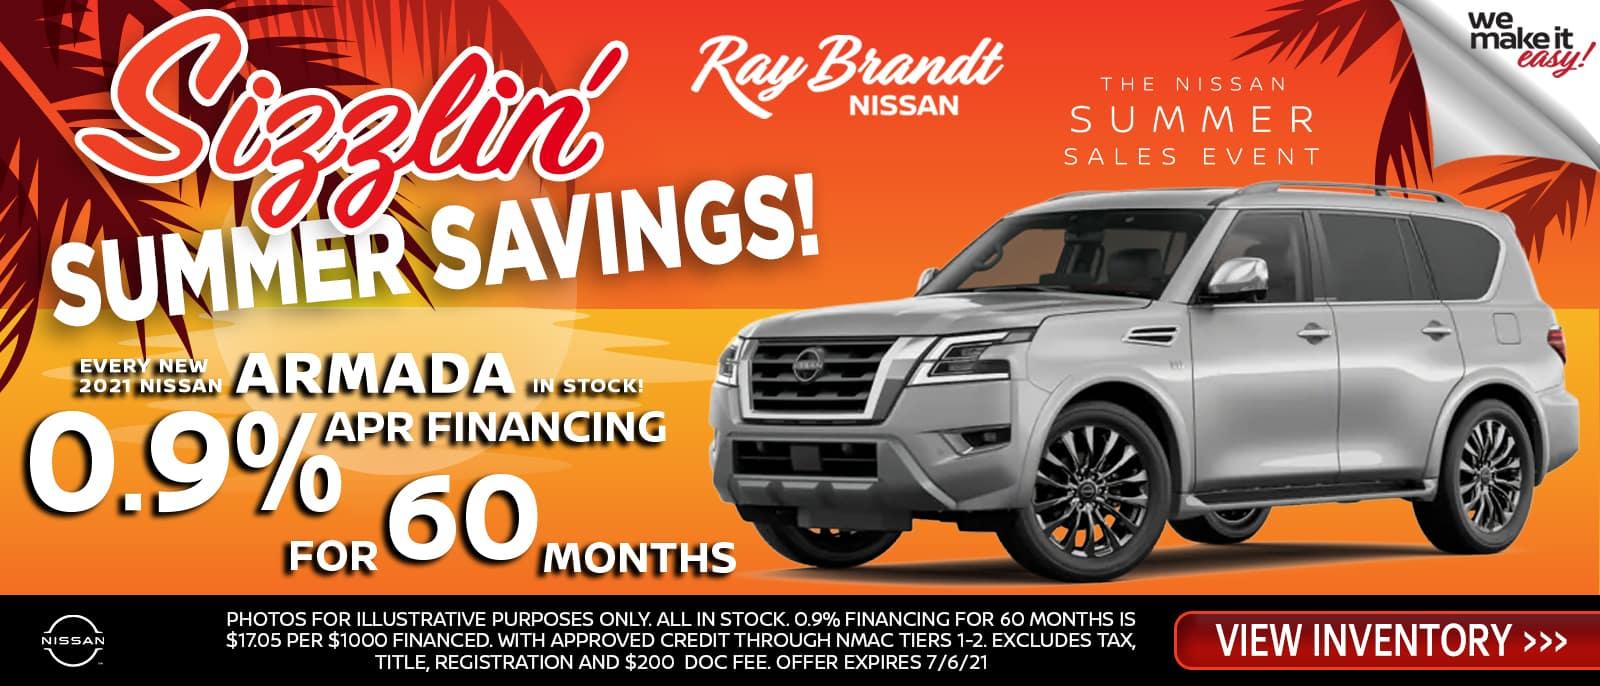 Nissan Armada for Sale near me, Harvey, Louisiana, Savings, Buy